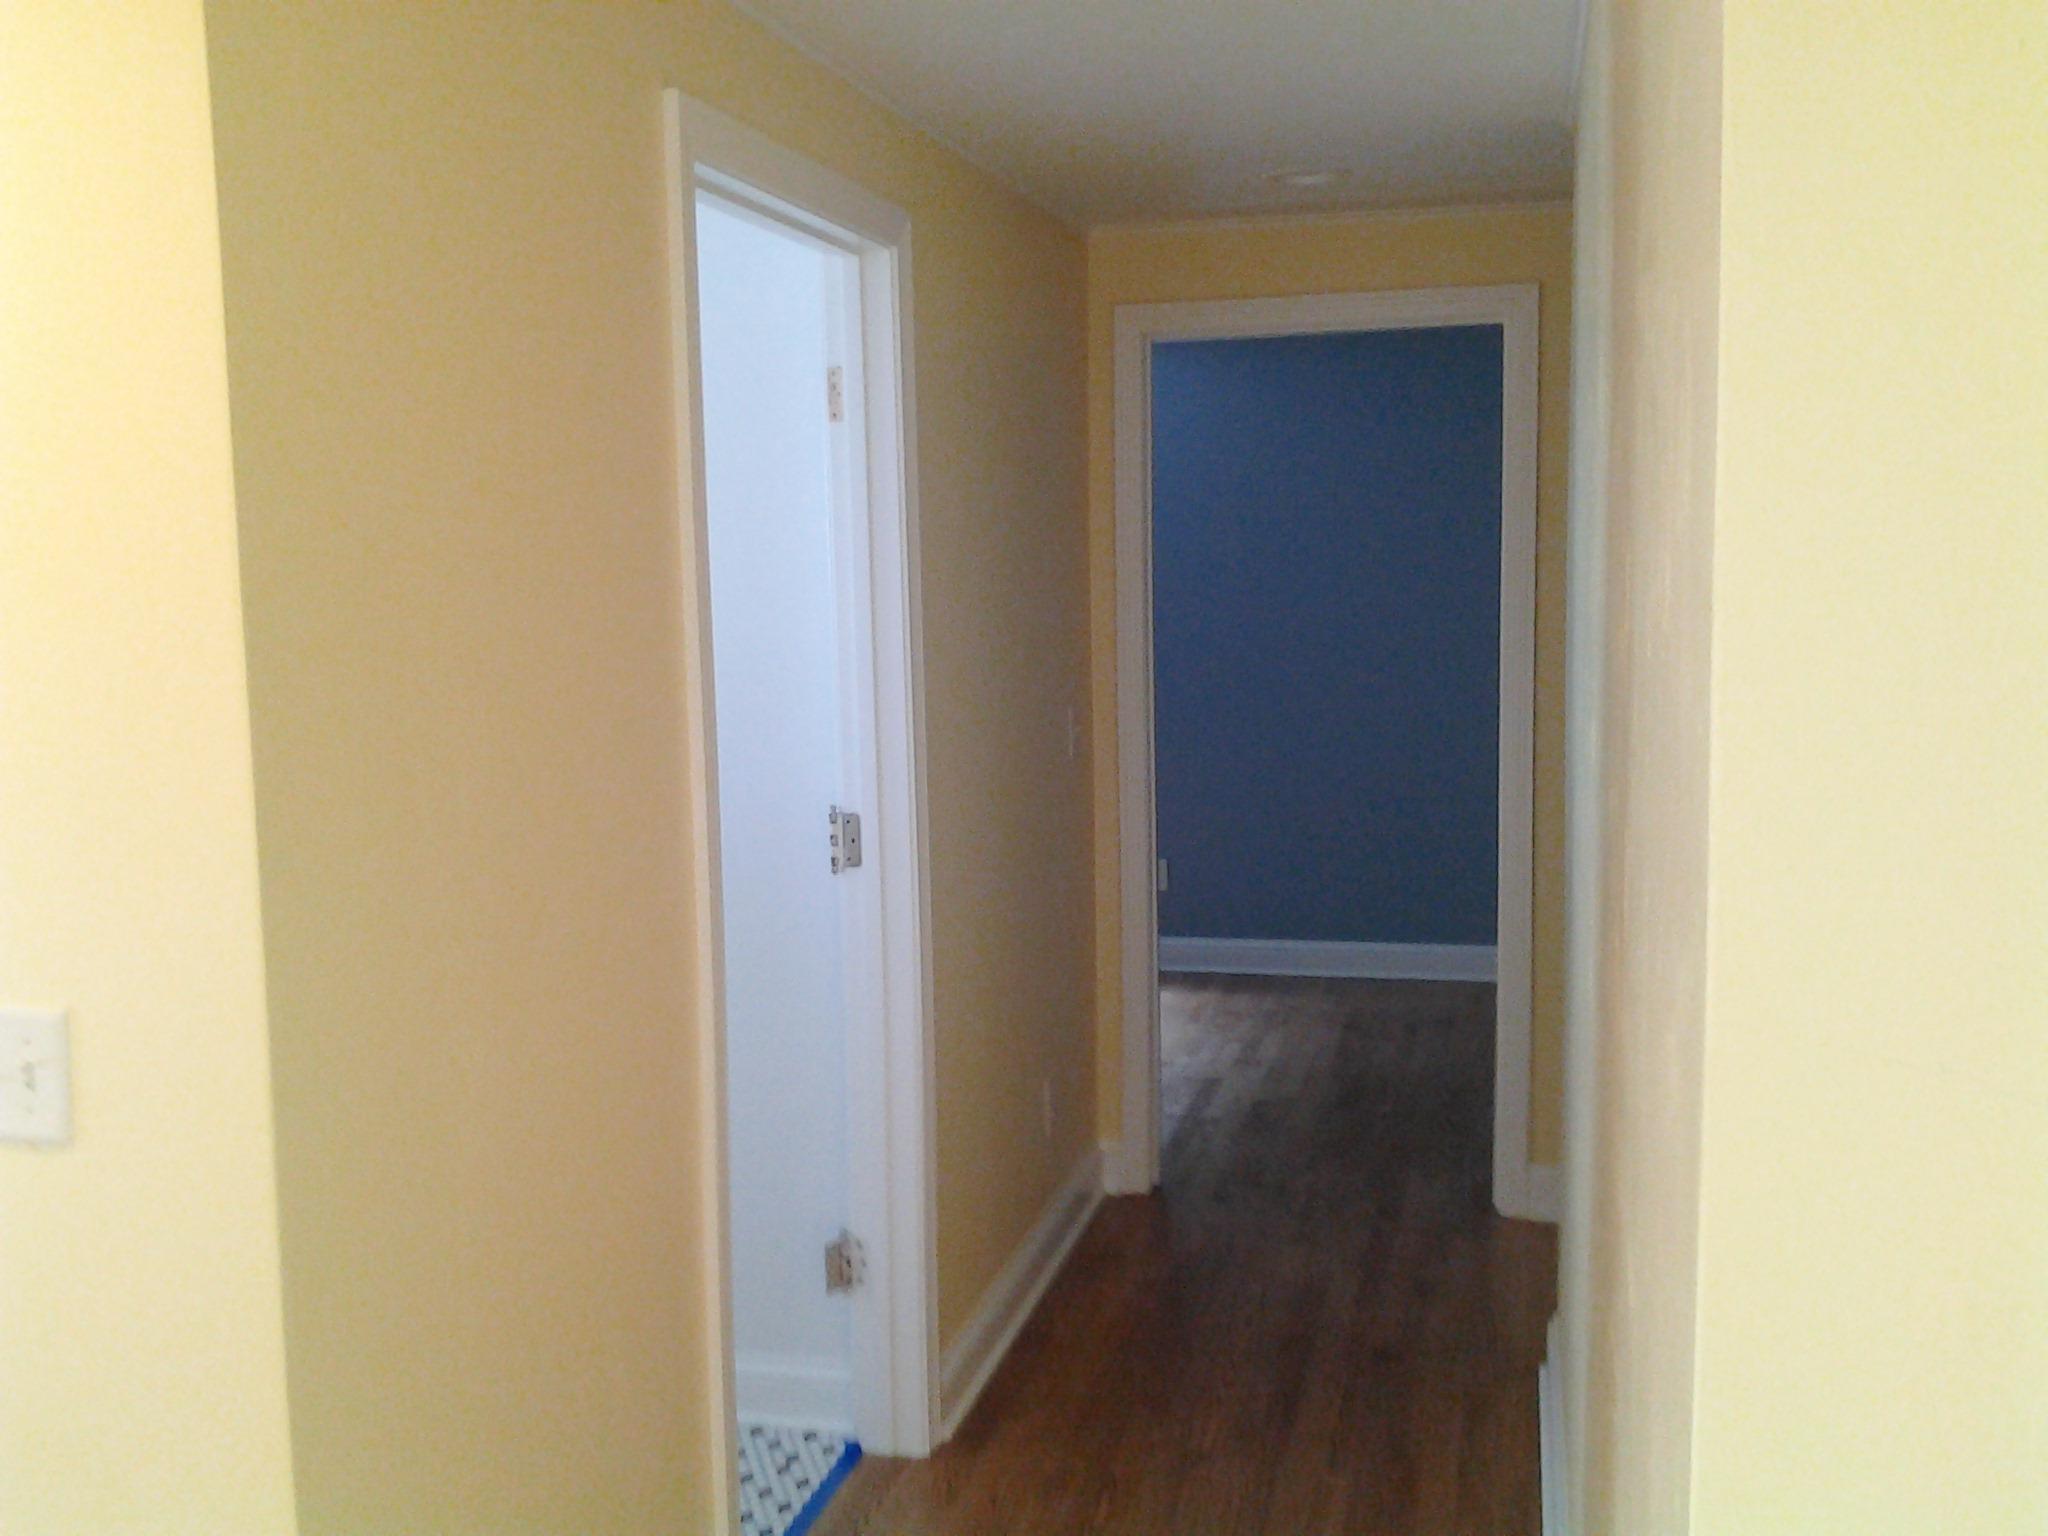 Hallway - Pakala Painting